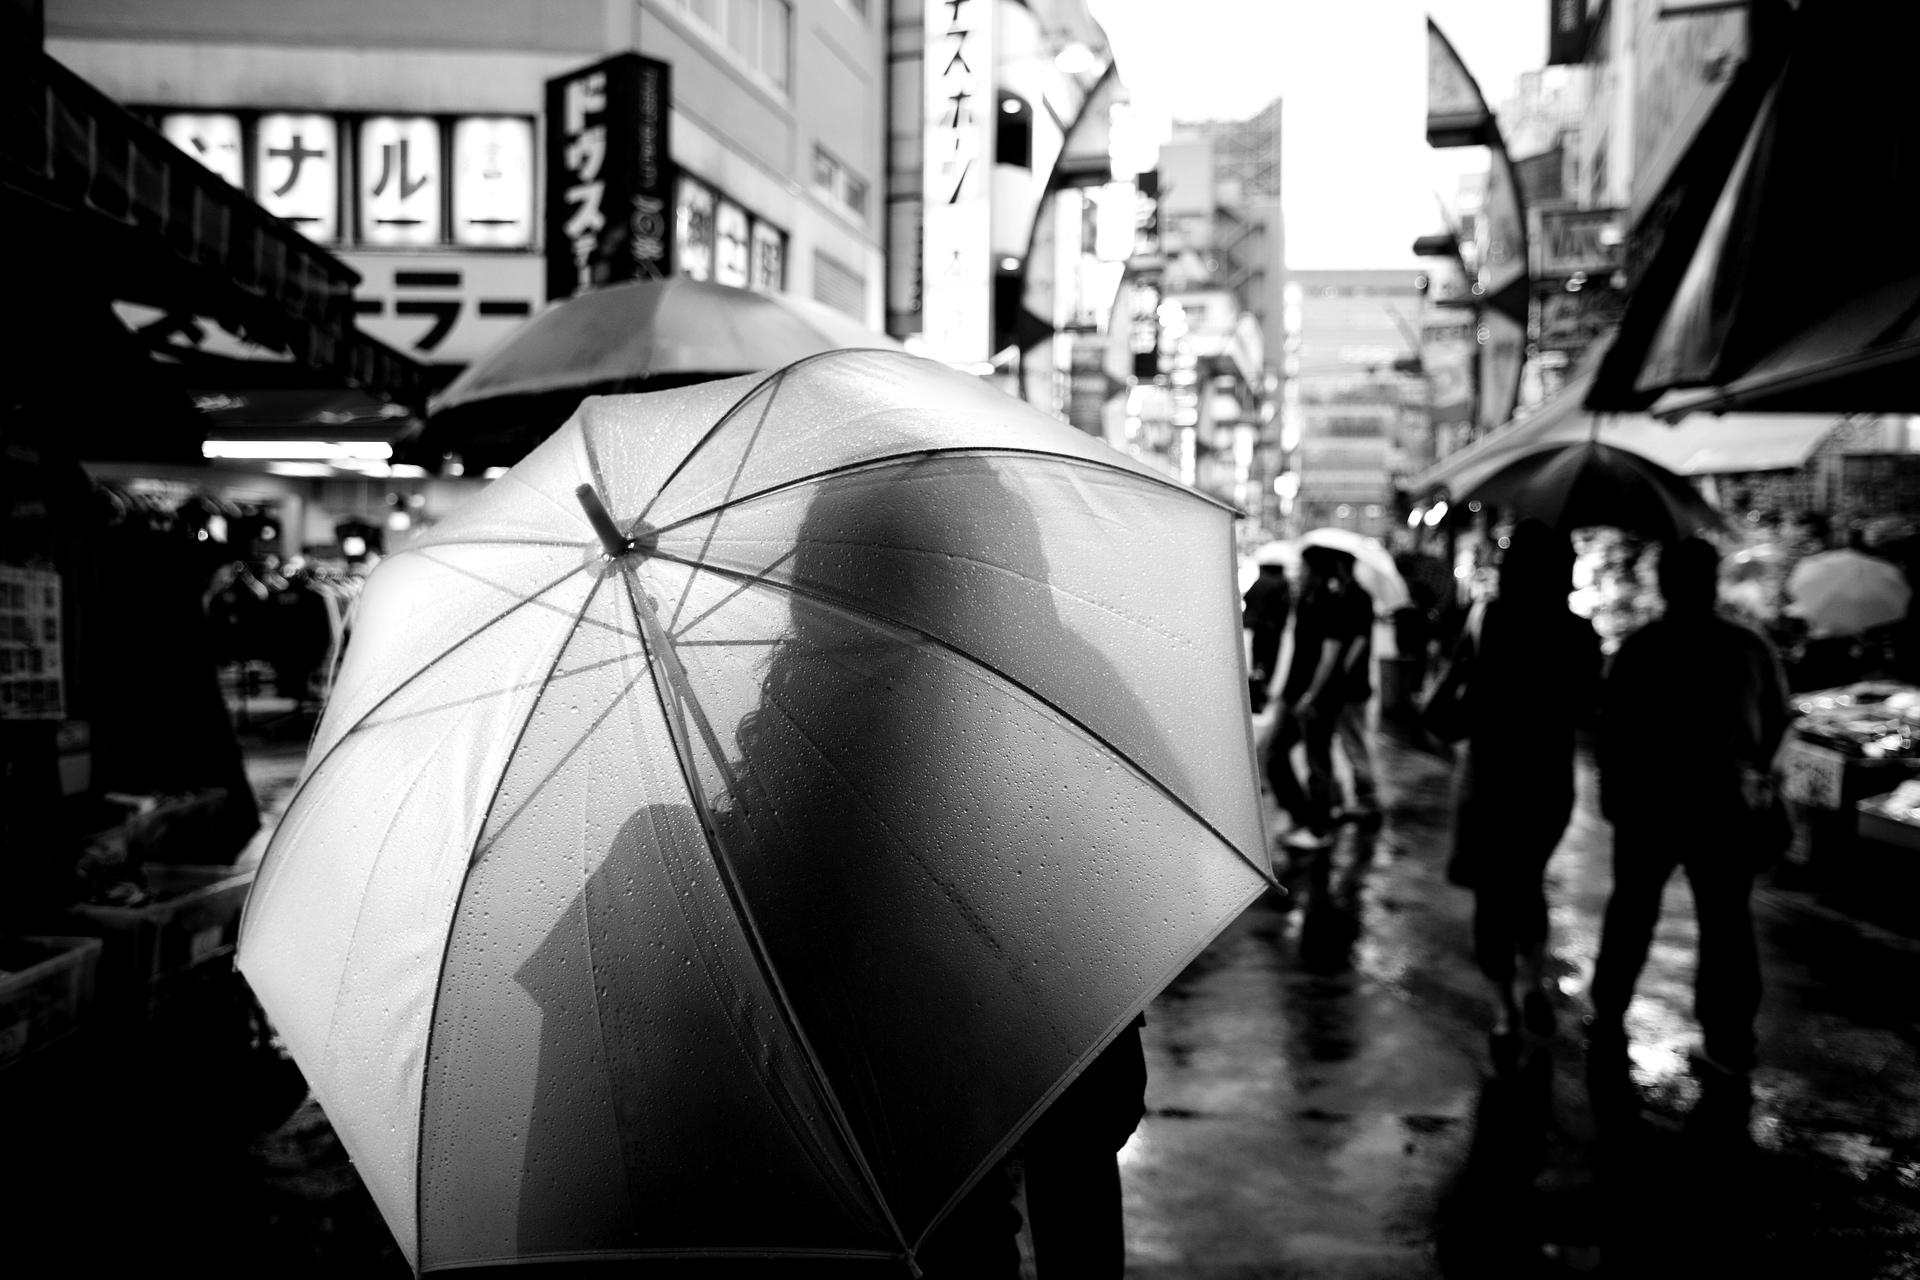 Sydney travel photographer, country, adventure, photo tour, travel photography, destinations, award winning, tips, lessons, Japan, Tokyo, Ueno, umbrella